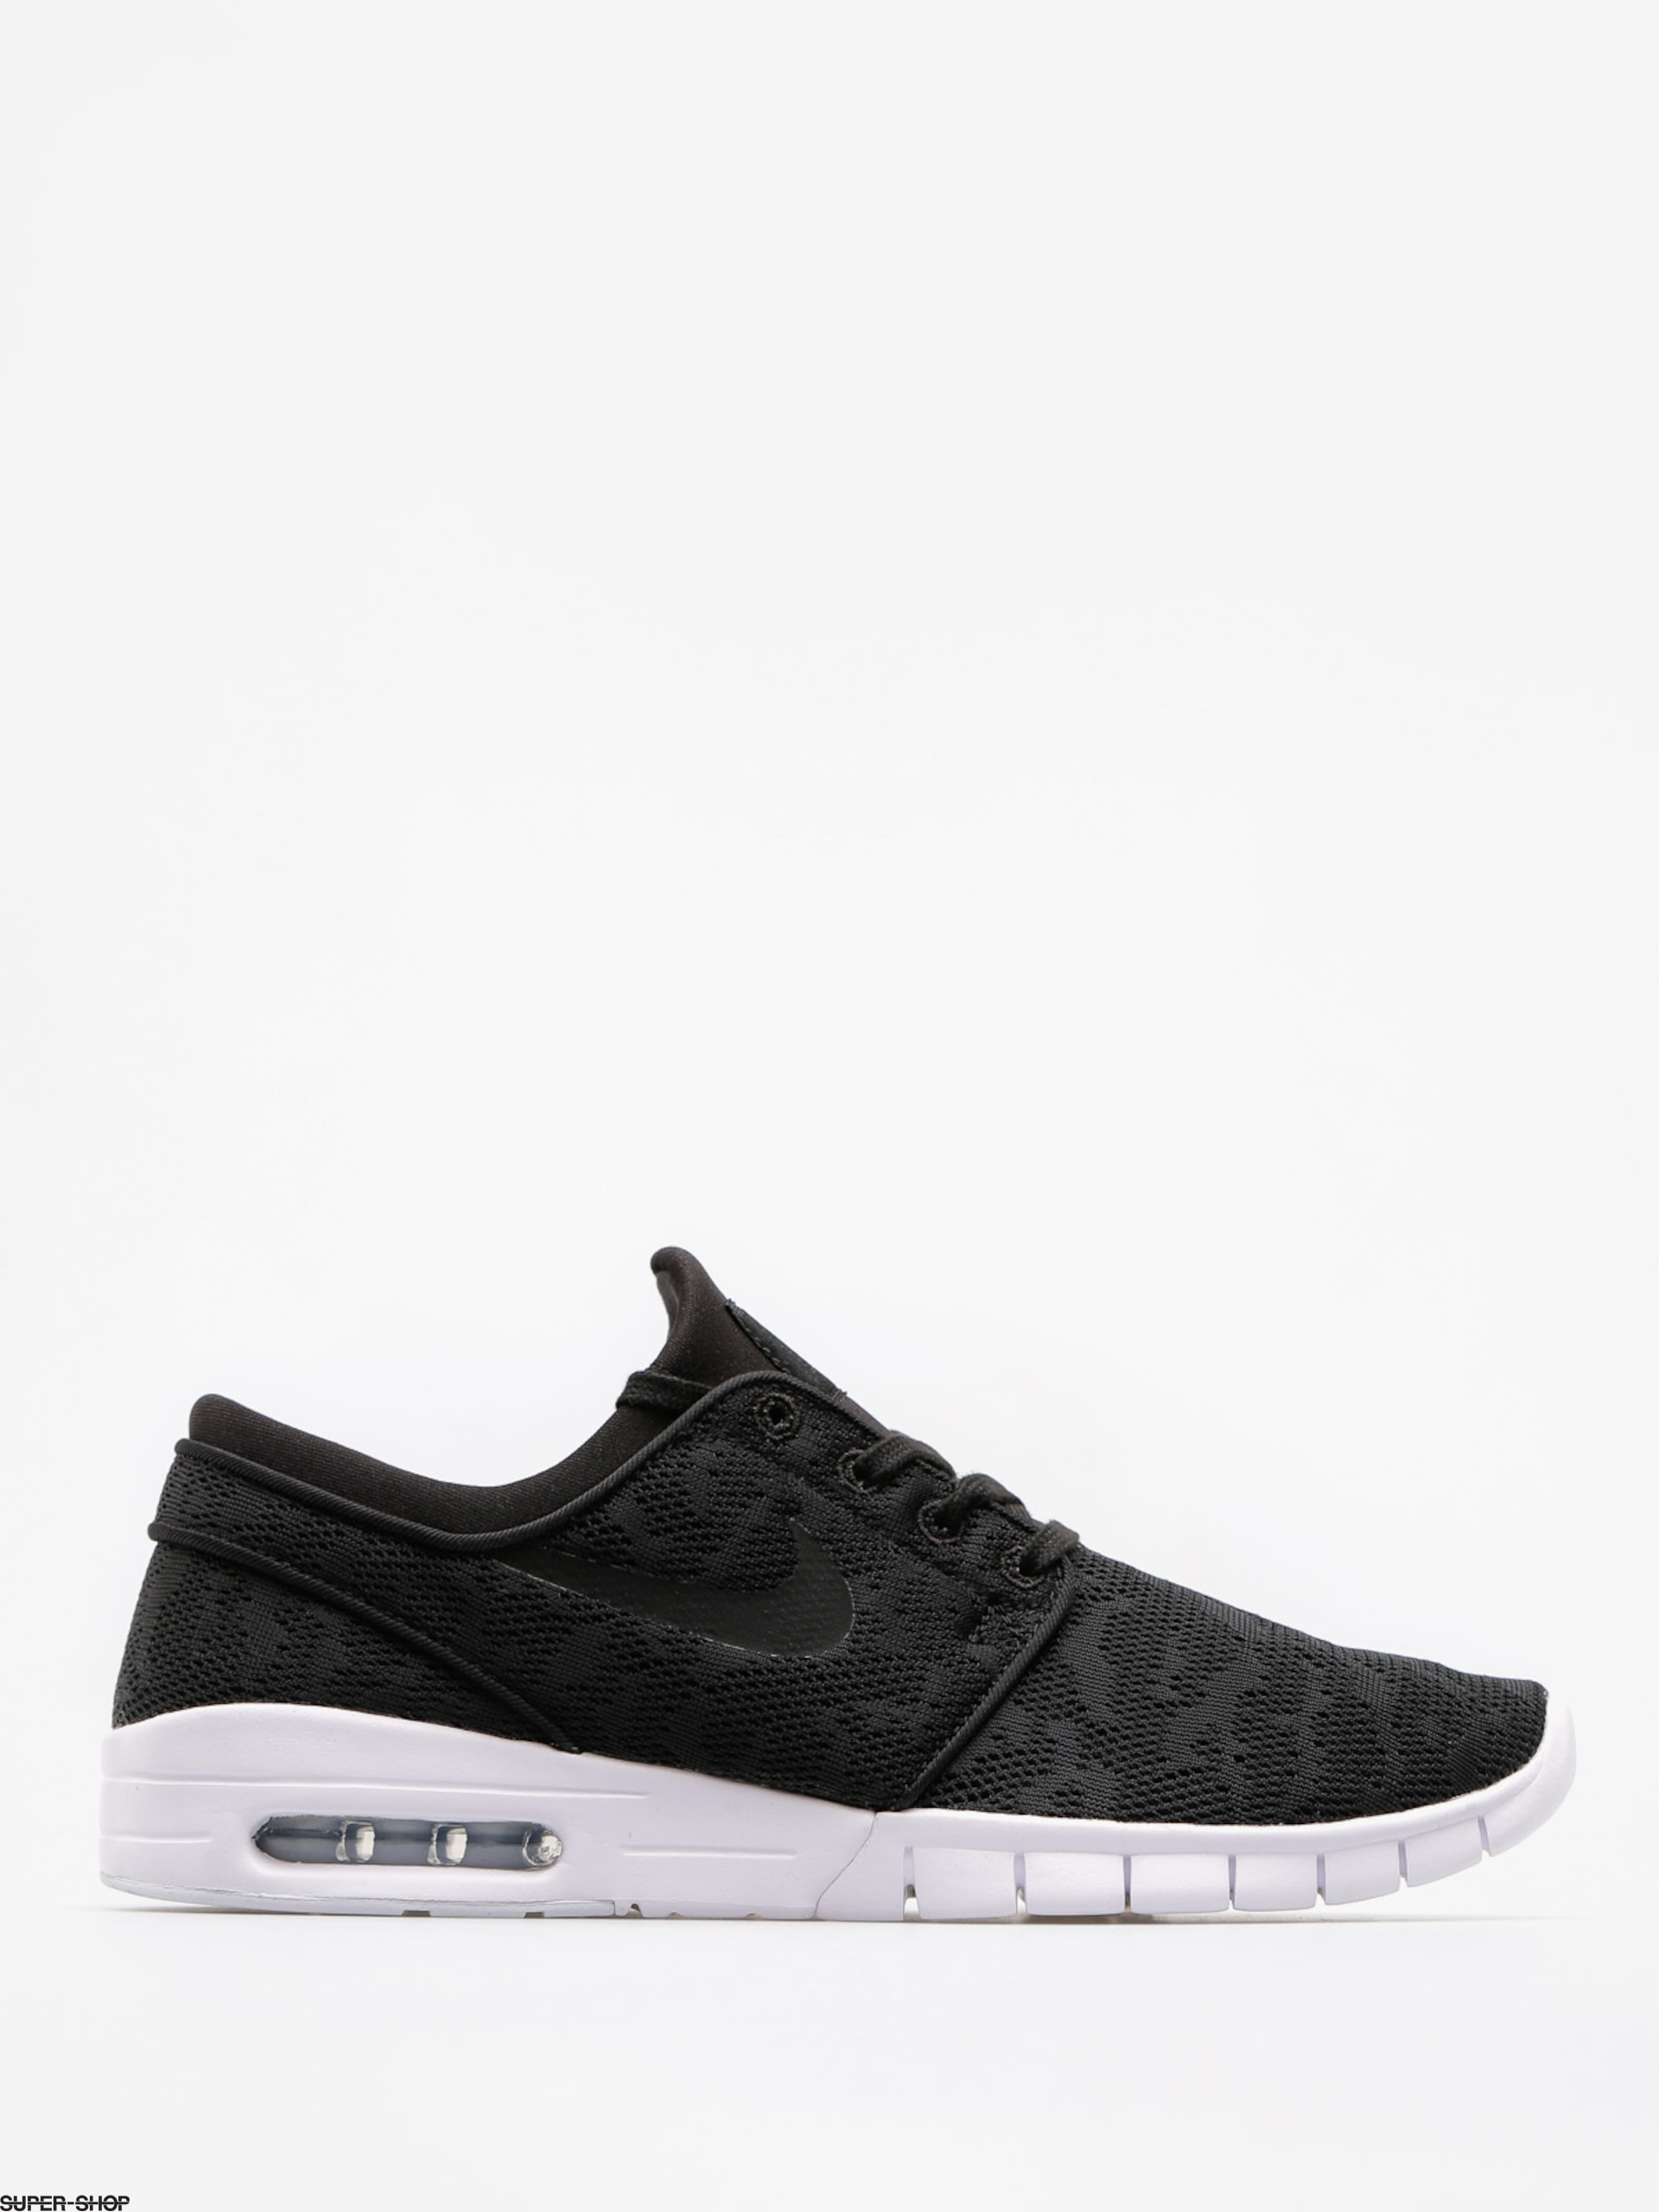 new collection 100% quality official photos Nike SB Schuhe Stefan Janoski Max (black/black white)